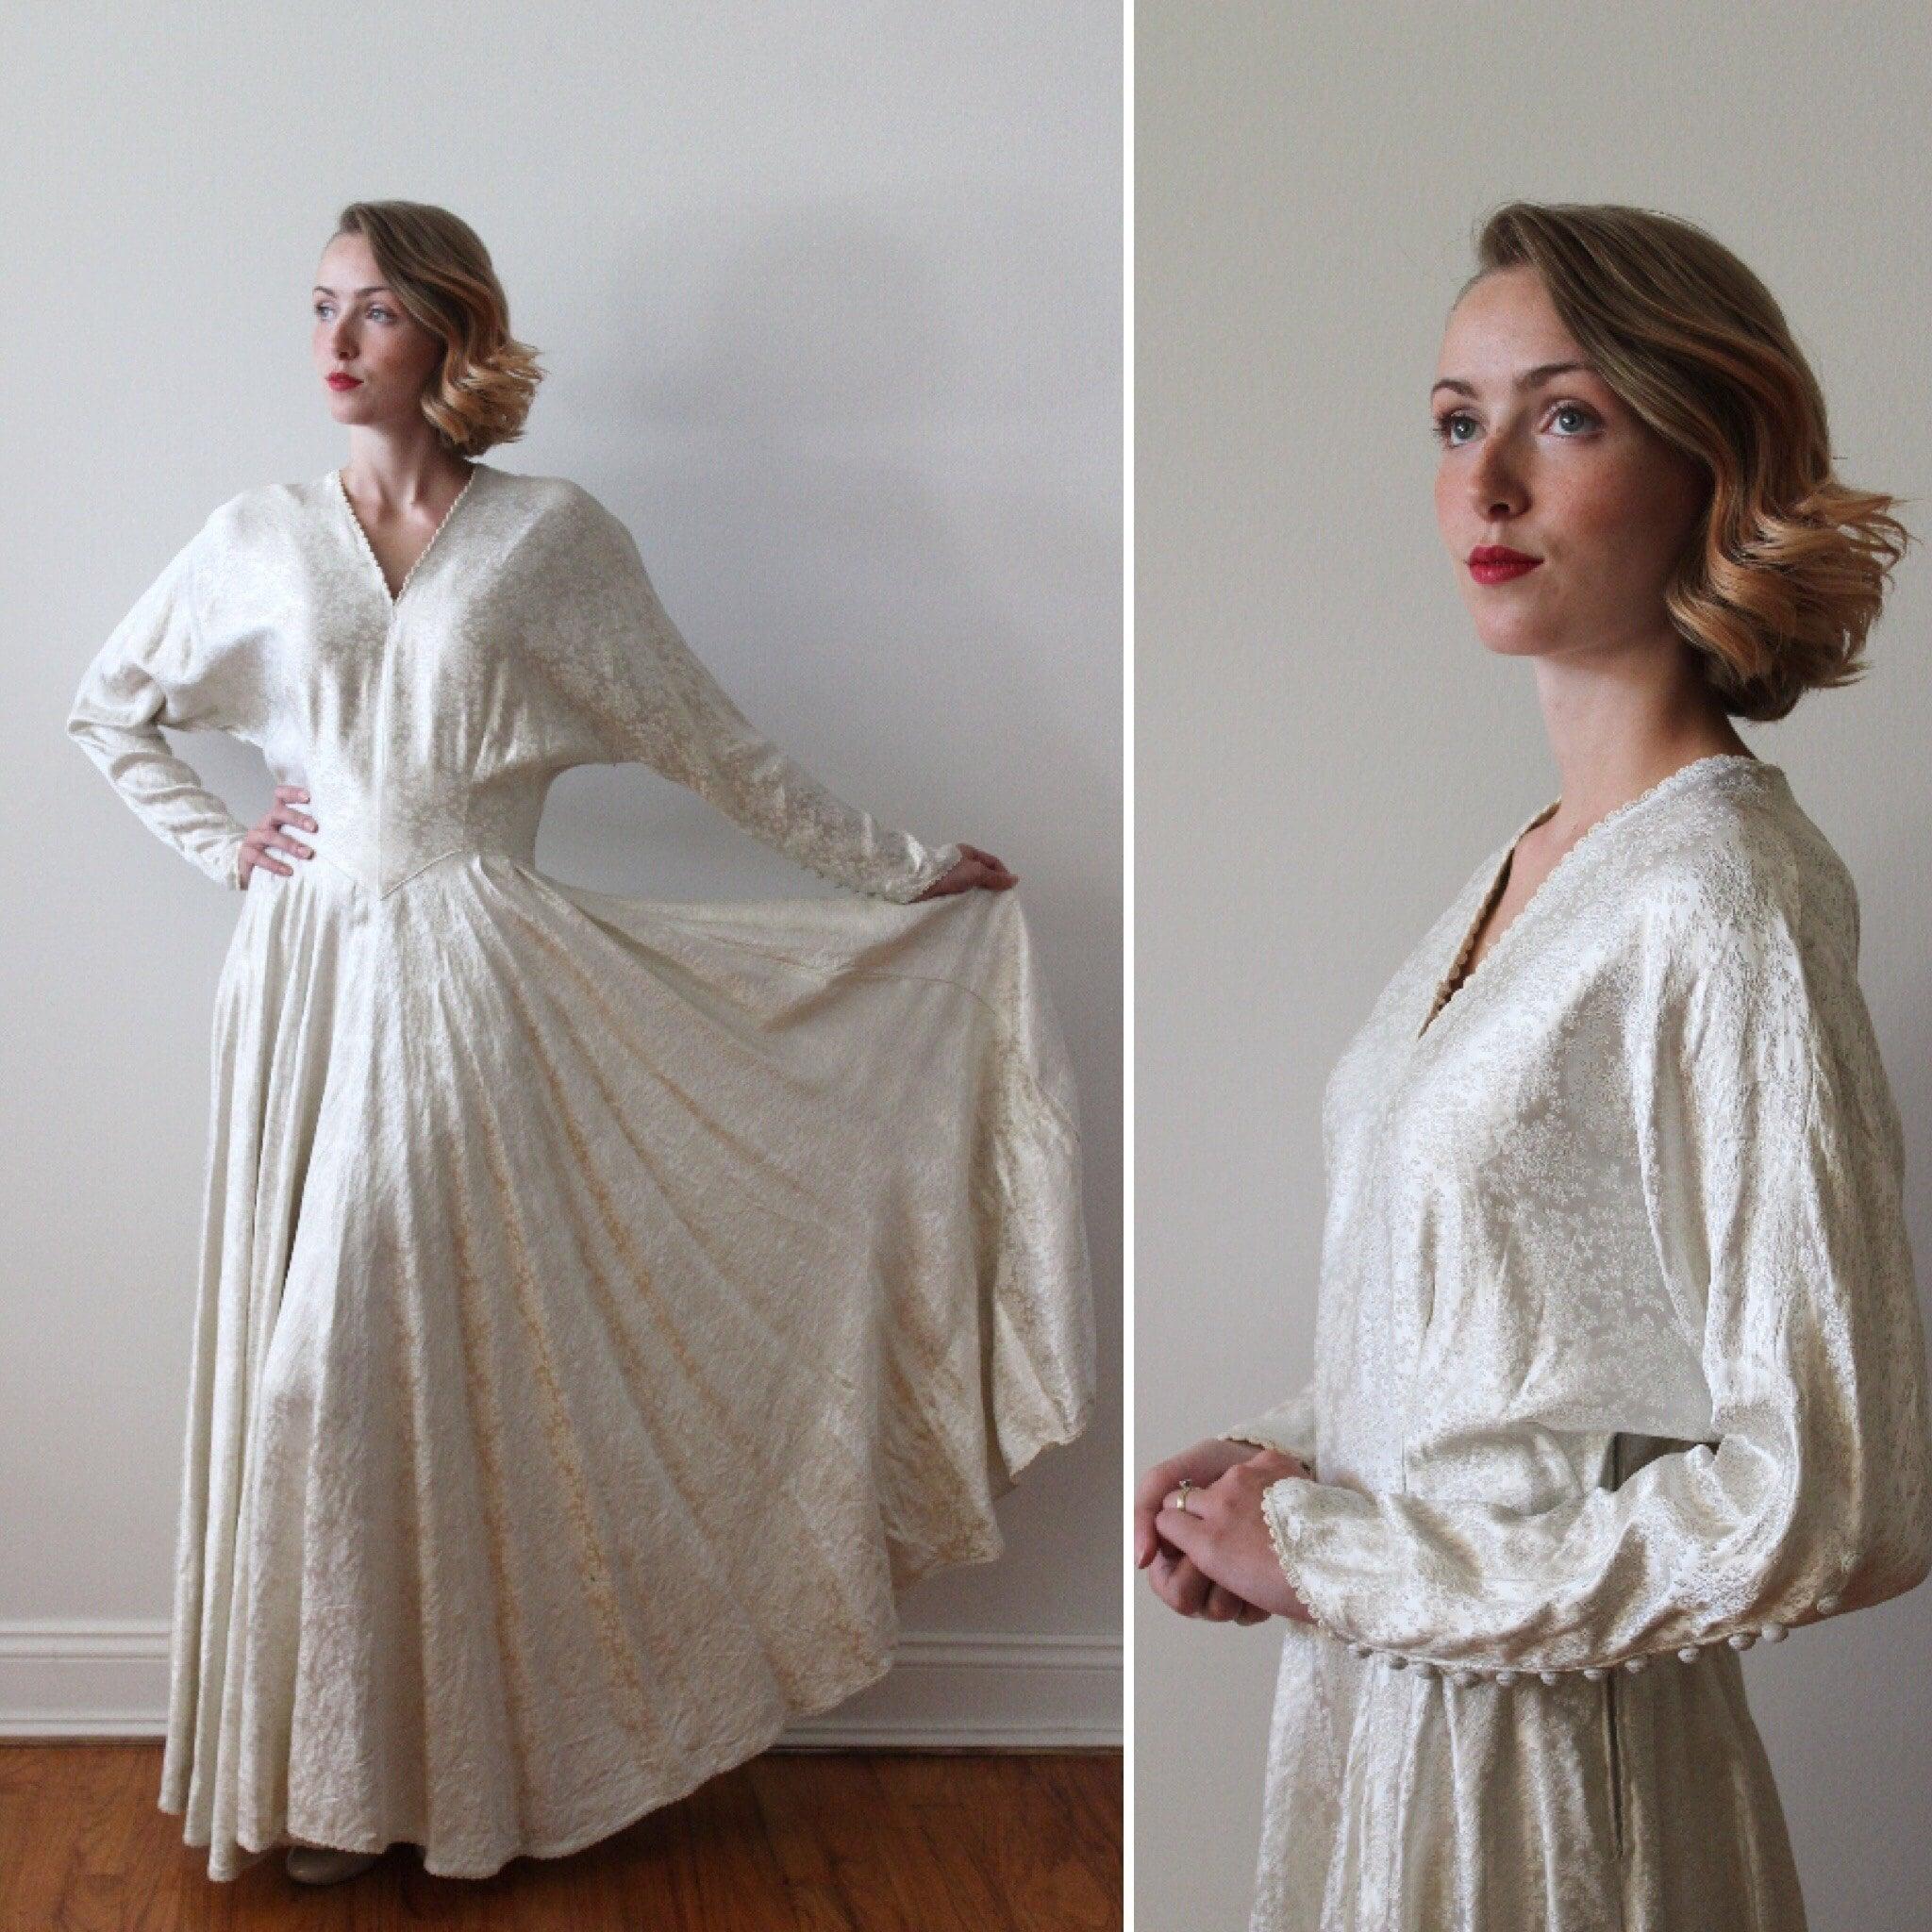 Vintage Wedding Dresses Canada: Vintage 1940s Long Sleeved Irish Brocade Wedding Dress